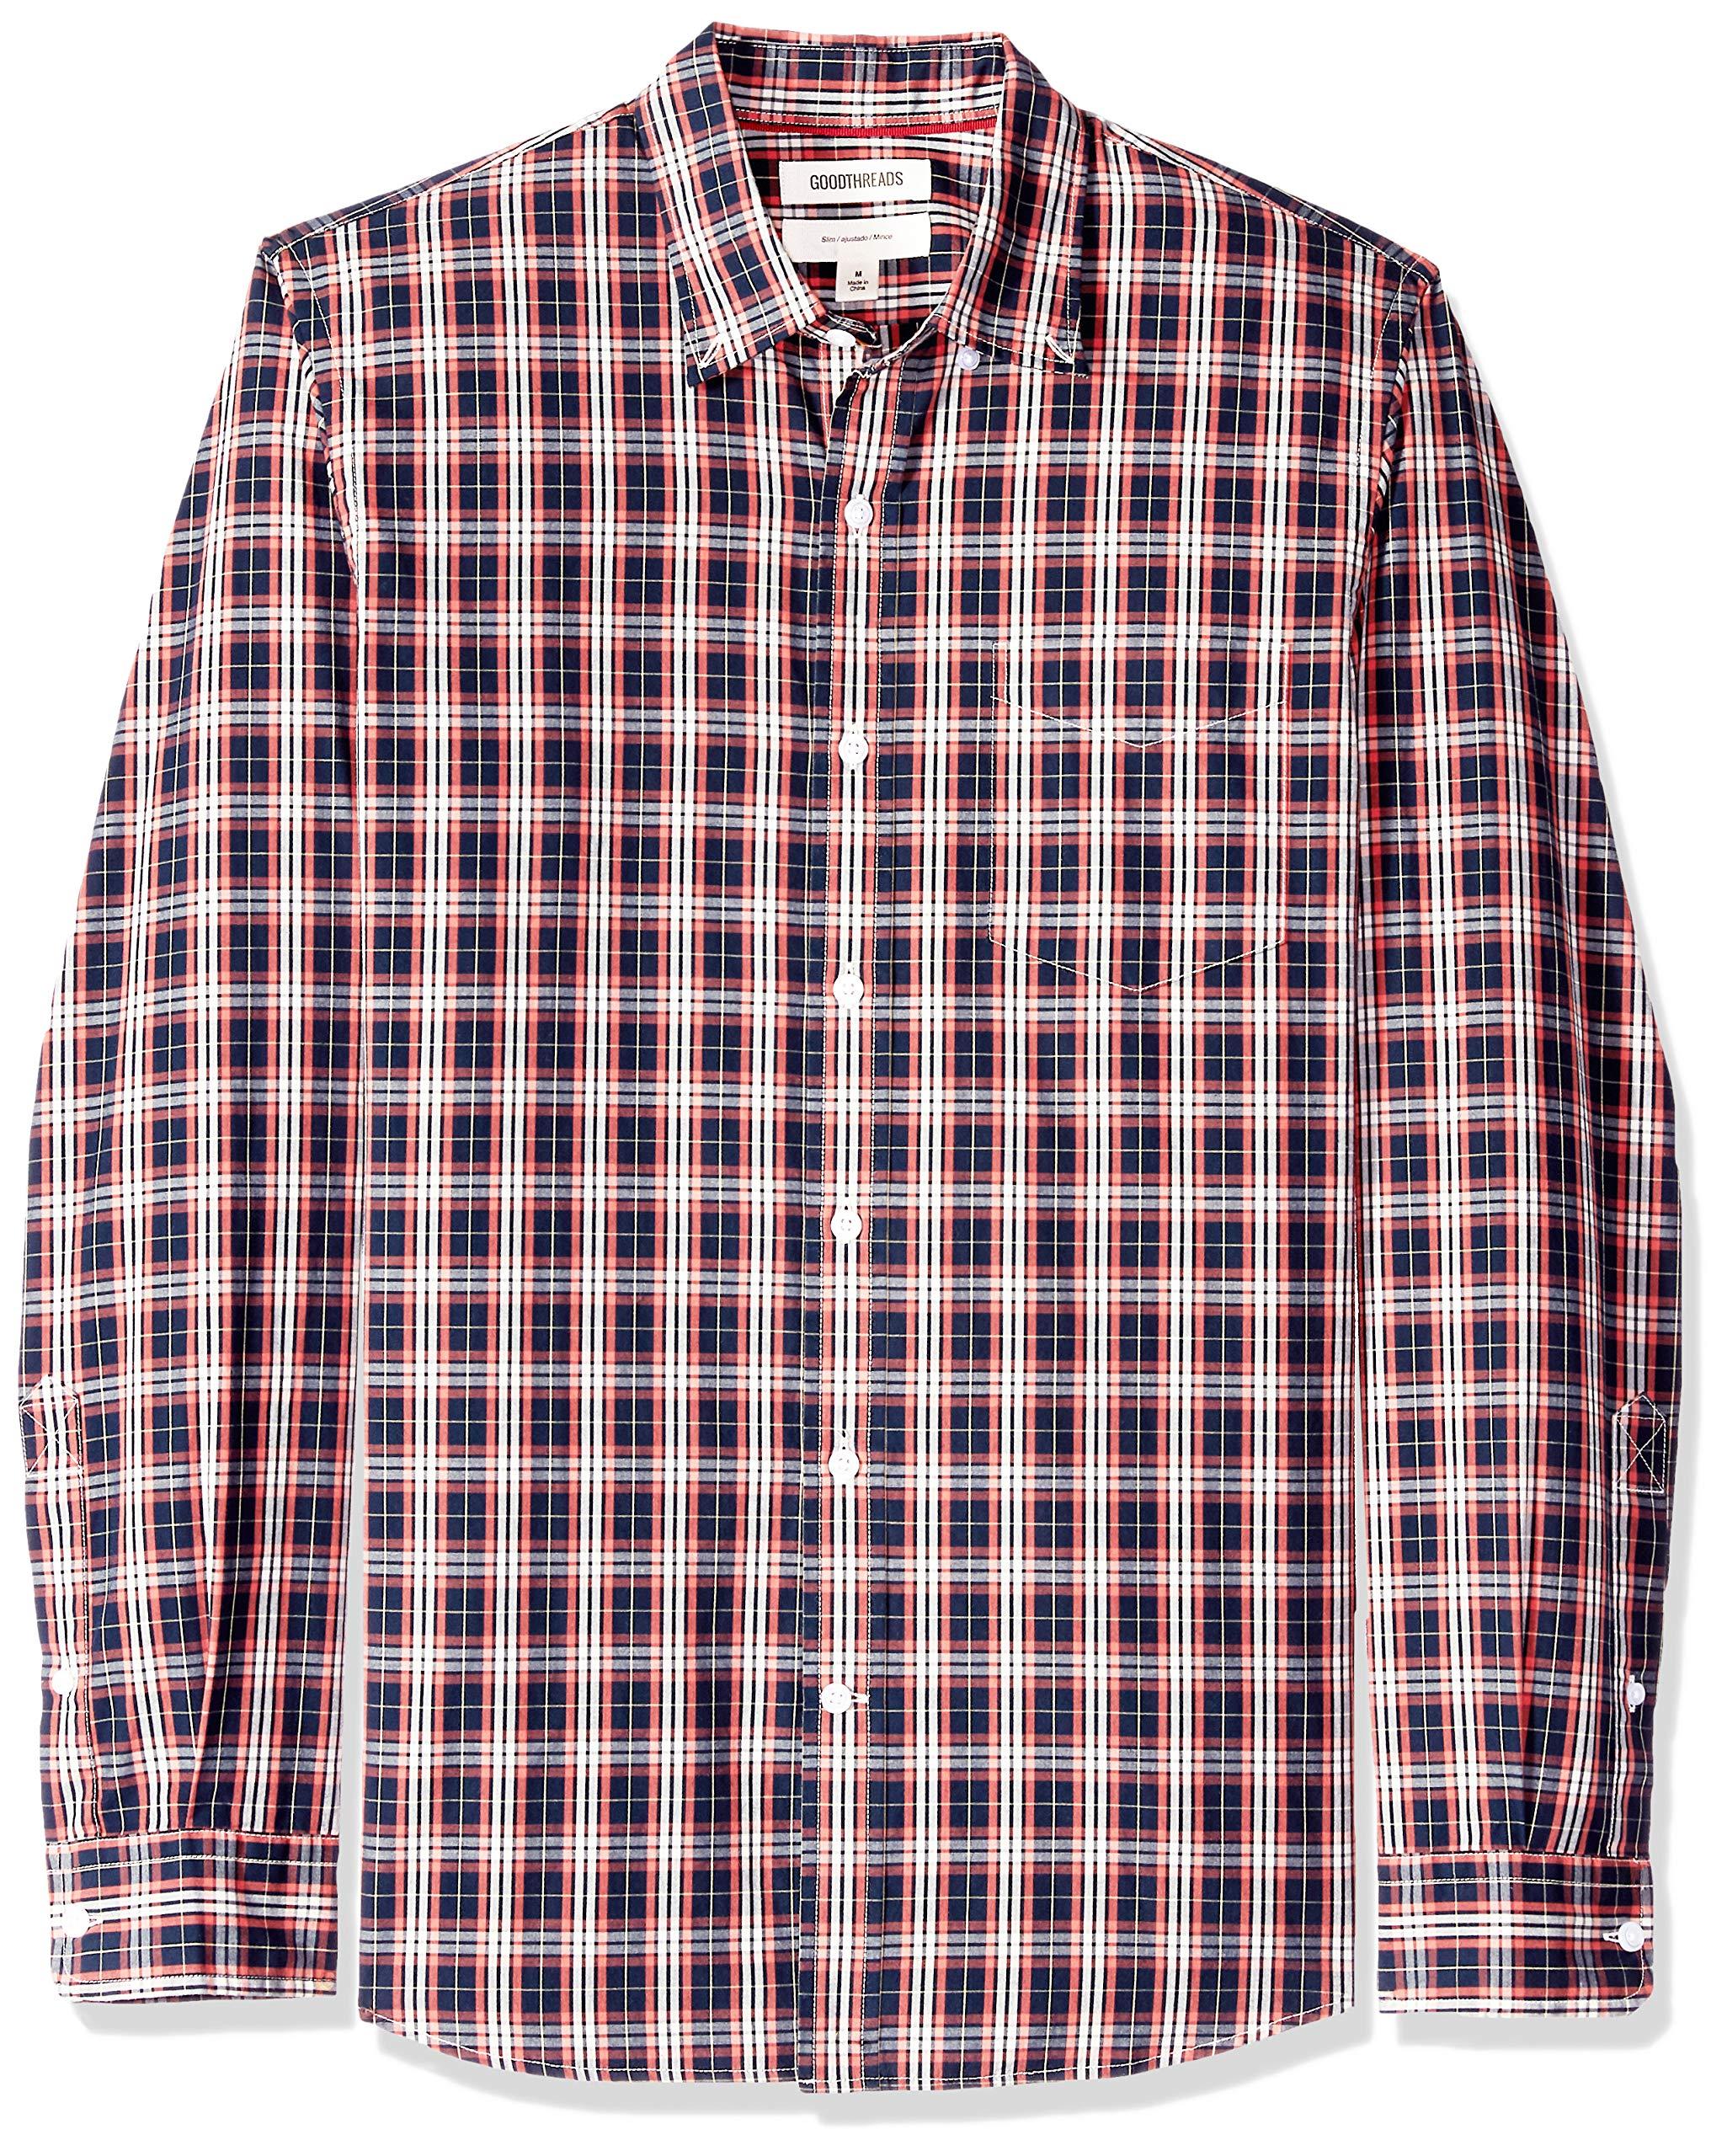 Goodthreads Mens Slim-Fit Long-Sleeve Plaid Poplin Shirt